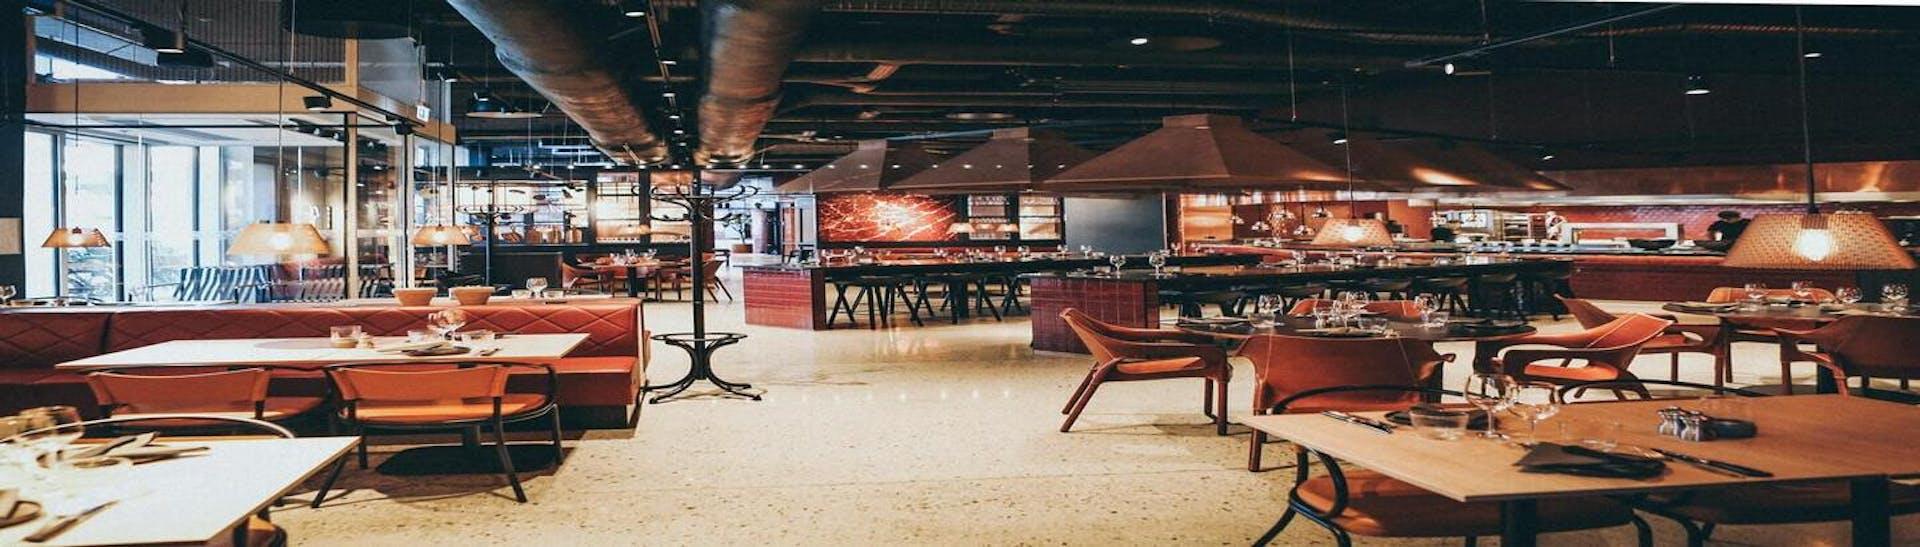 +89 Ideas de slogan para restaurantes que te ayudarán a fidelizar clientes